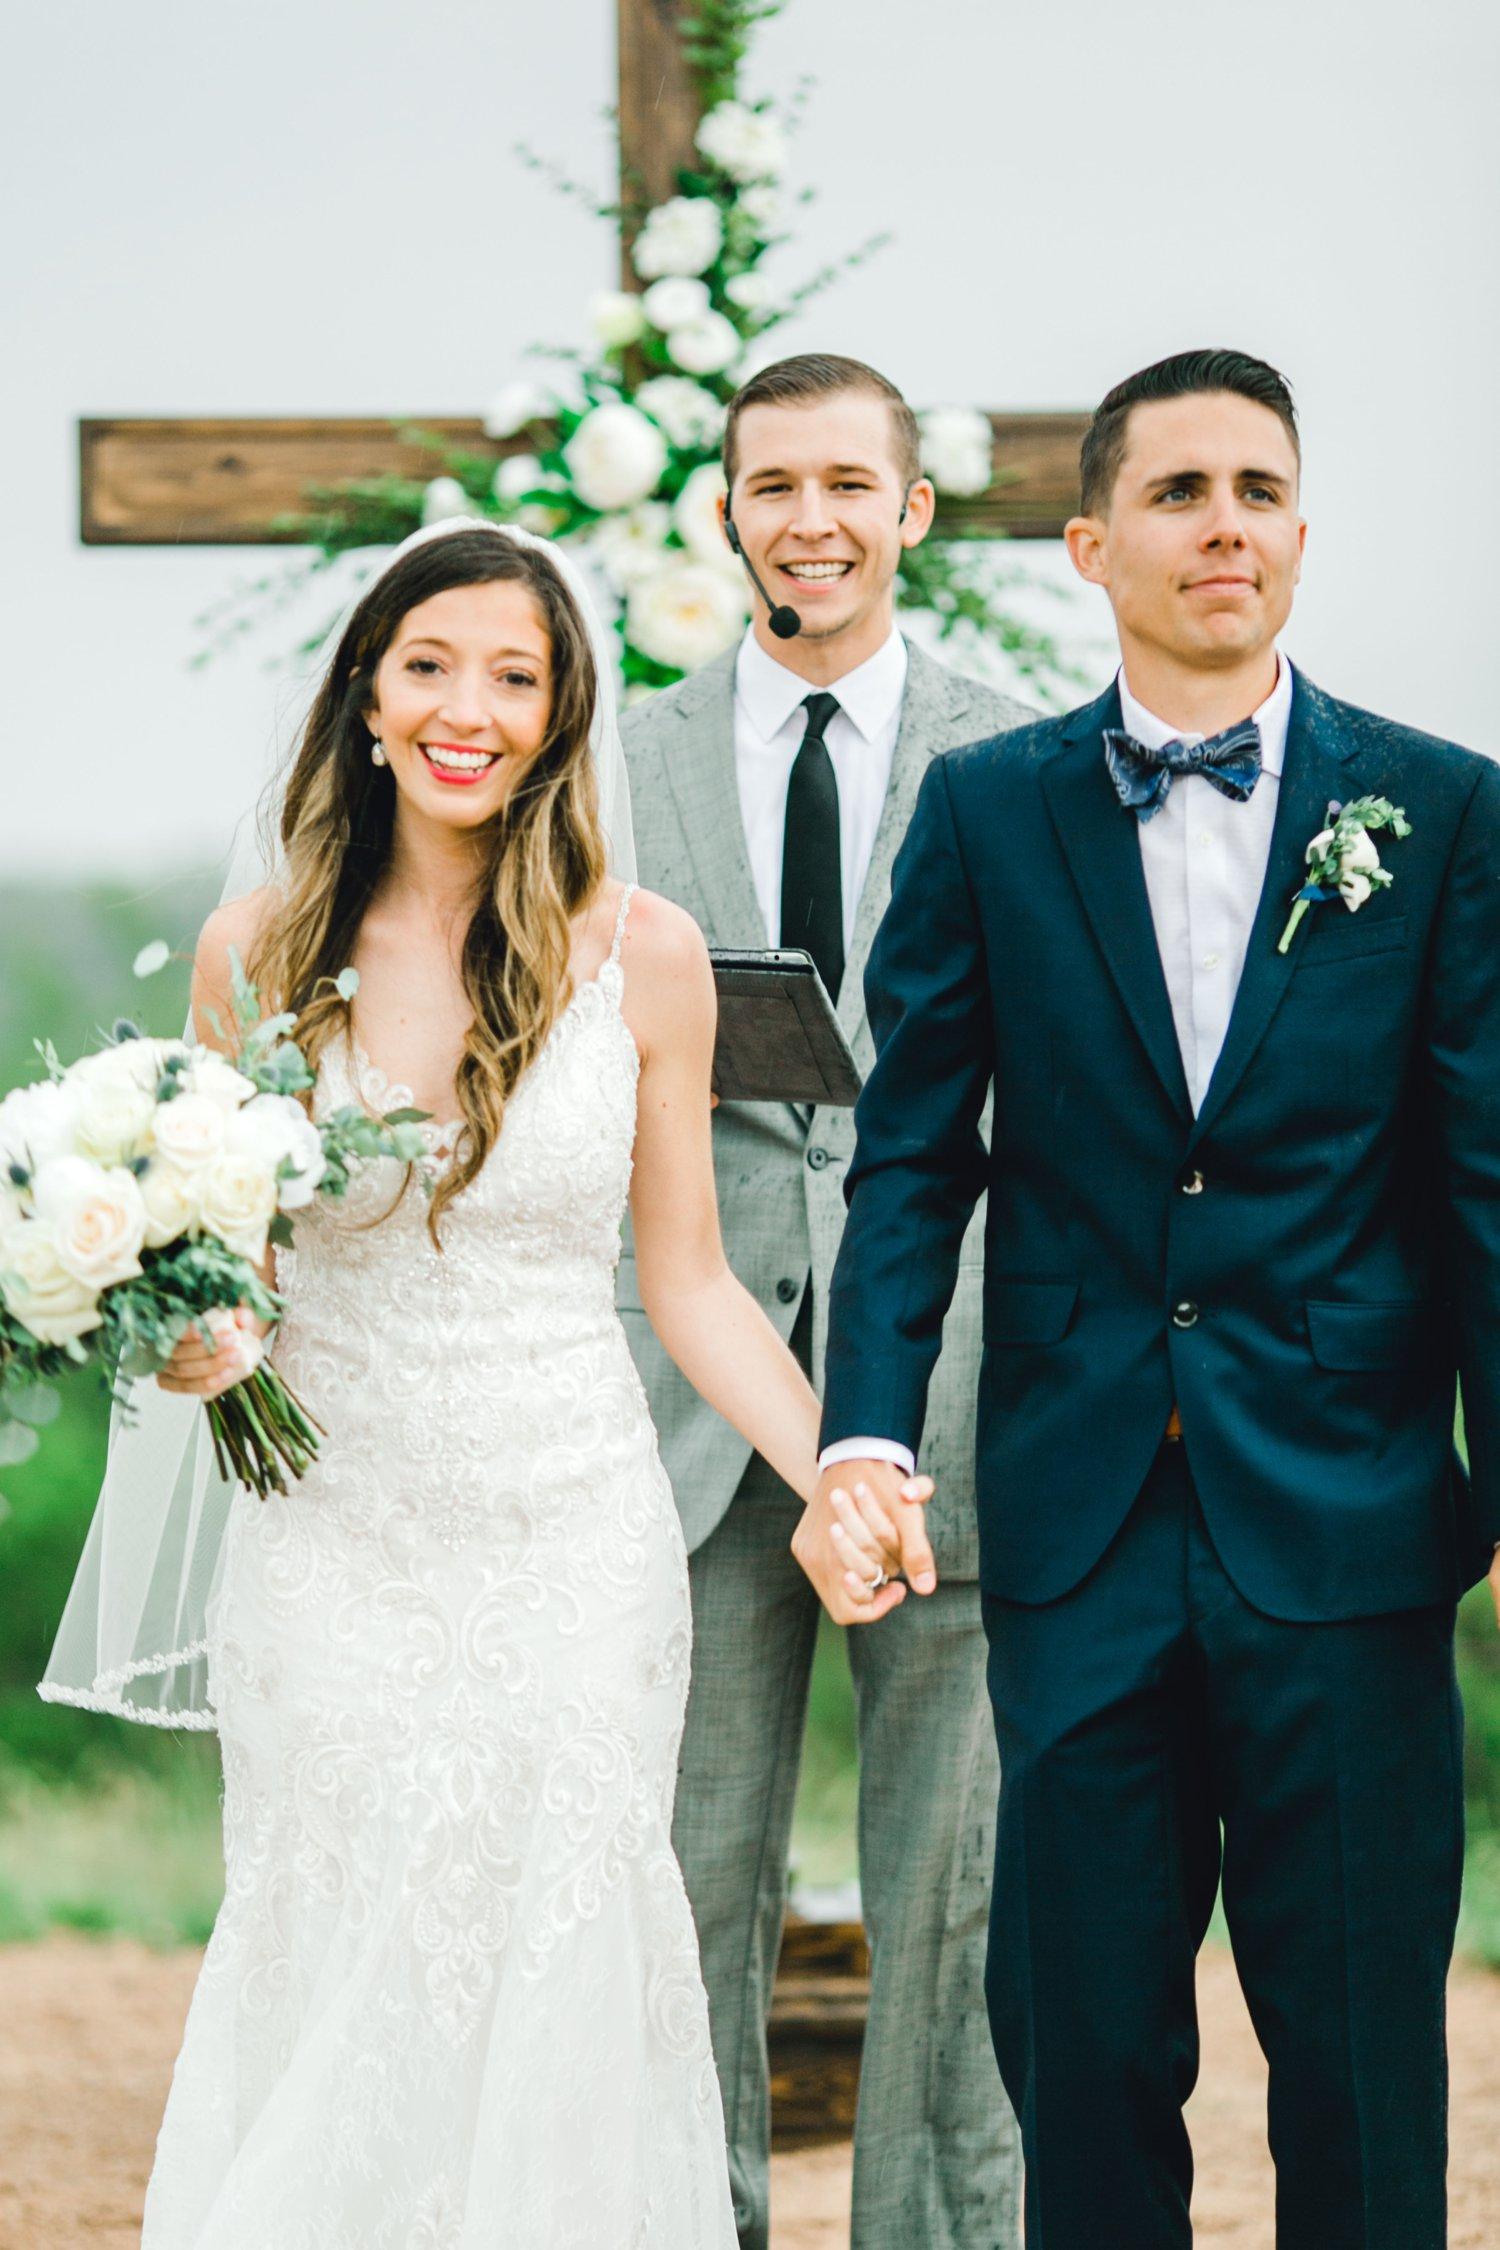 Ashley_John_English_Elegant_Texas_Wedding_Outdoors_Ranch_Caprock_Winery_ALLEEJ_0147.jpg